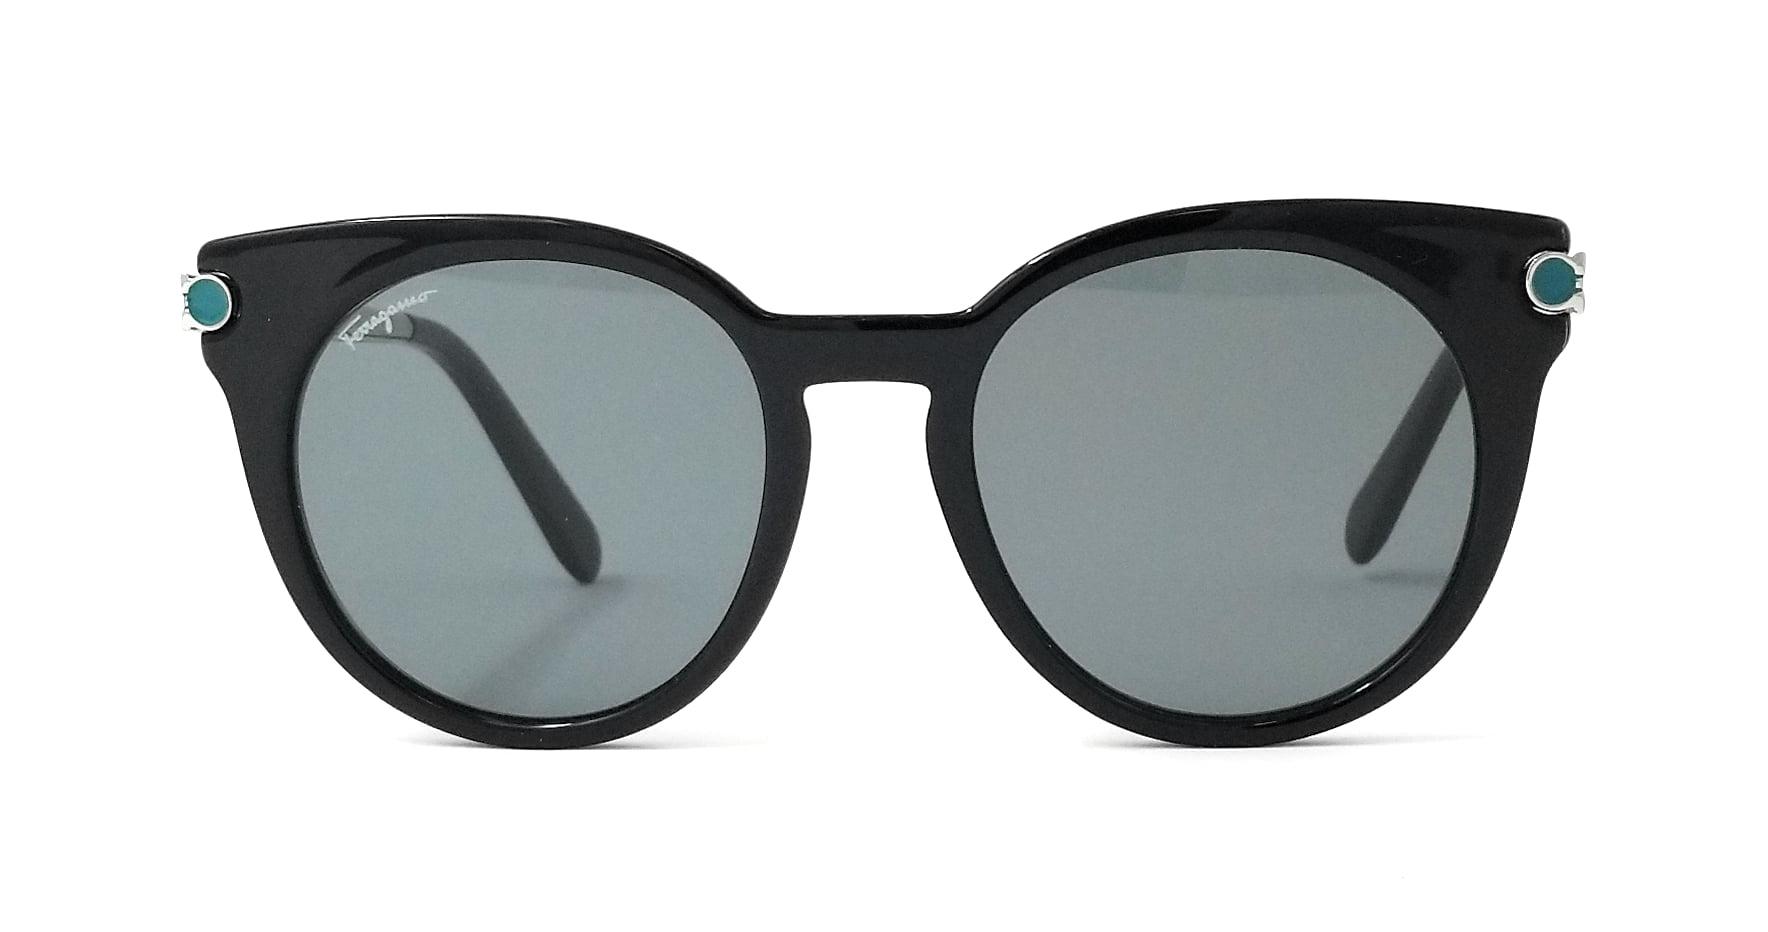 4172ccd20c Salvatore Ferragamo - Salvatore Ferragamo Sunglasses SF831S 976 Black-Silver  Round Womens 51x19x140 - Walmart.com